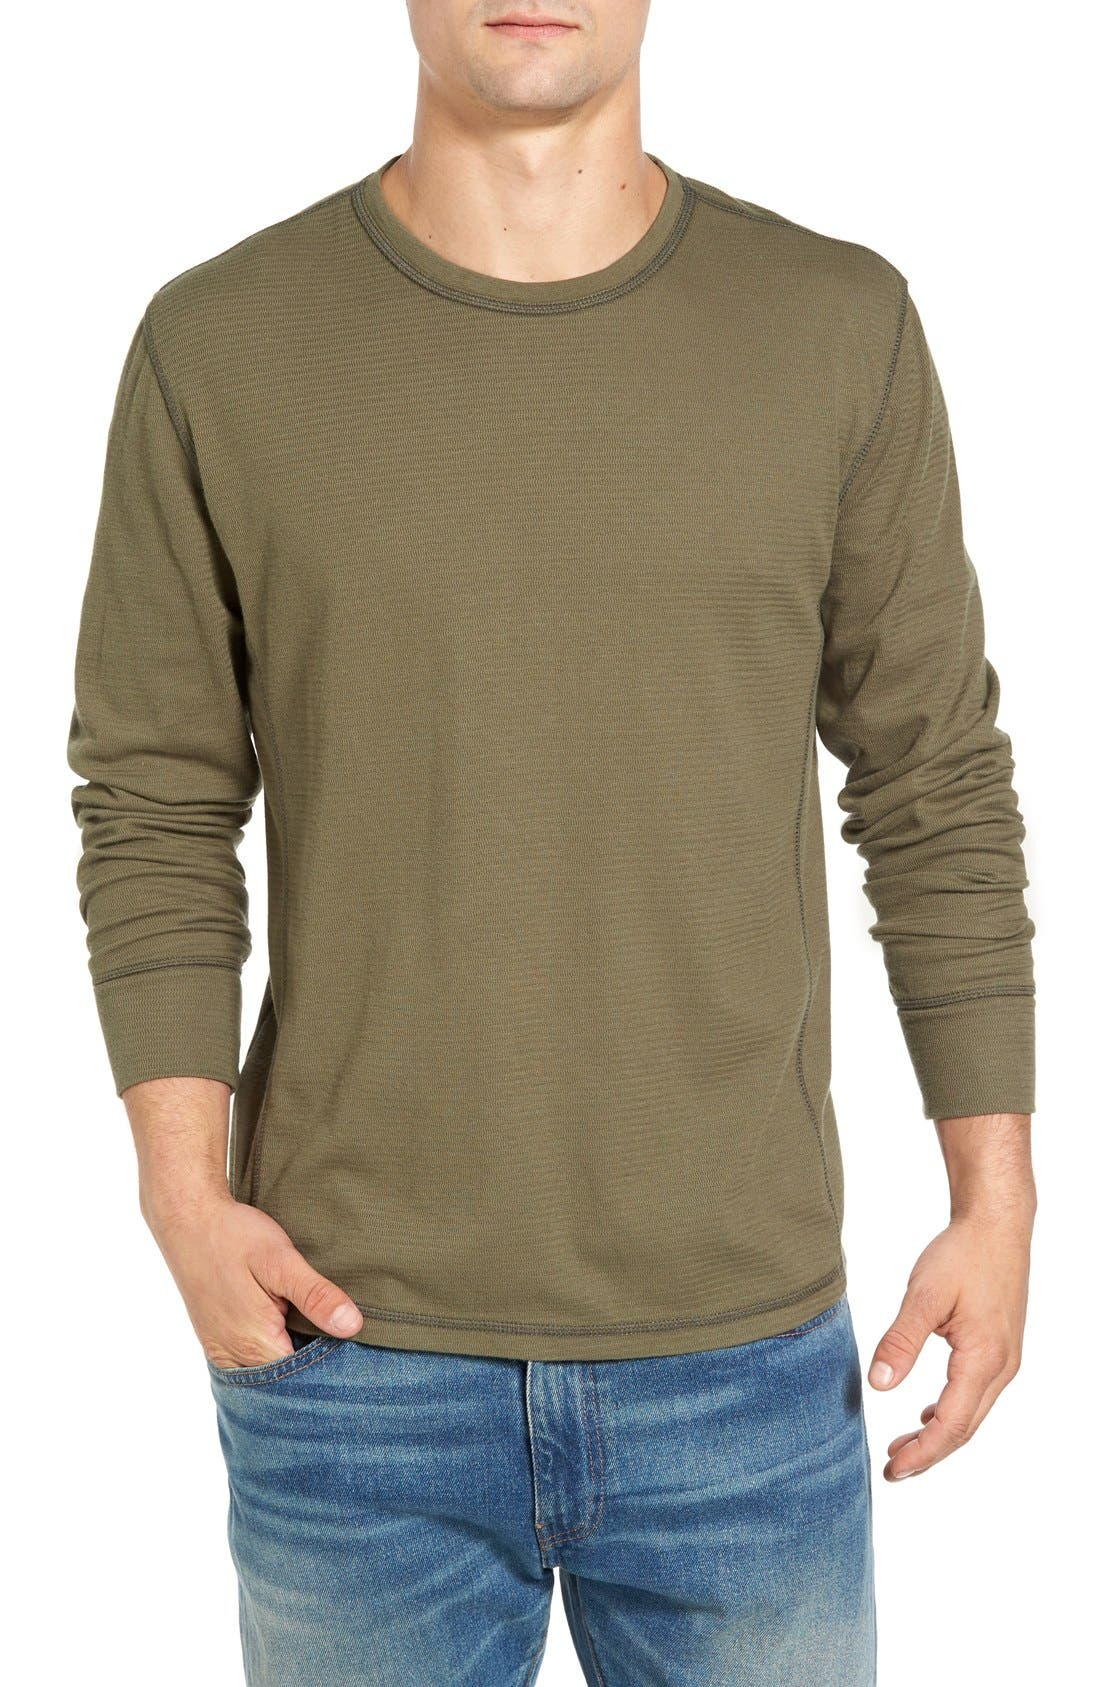 Jeremiah Larsen Zigzag Thermal T-Shirt